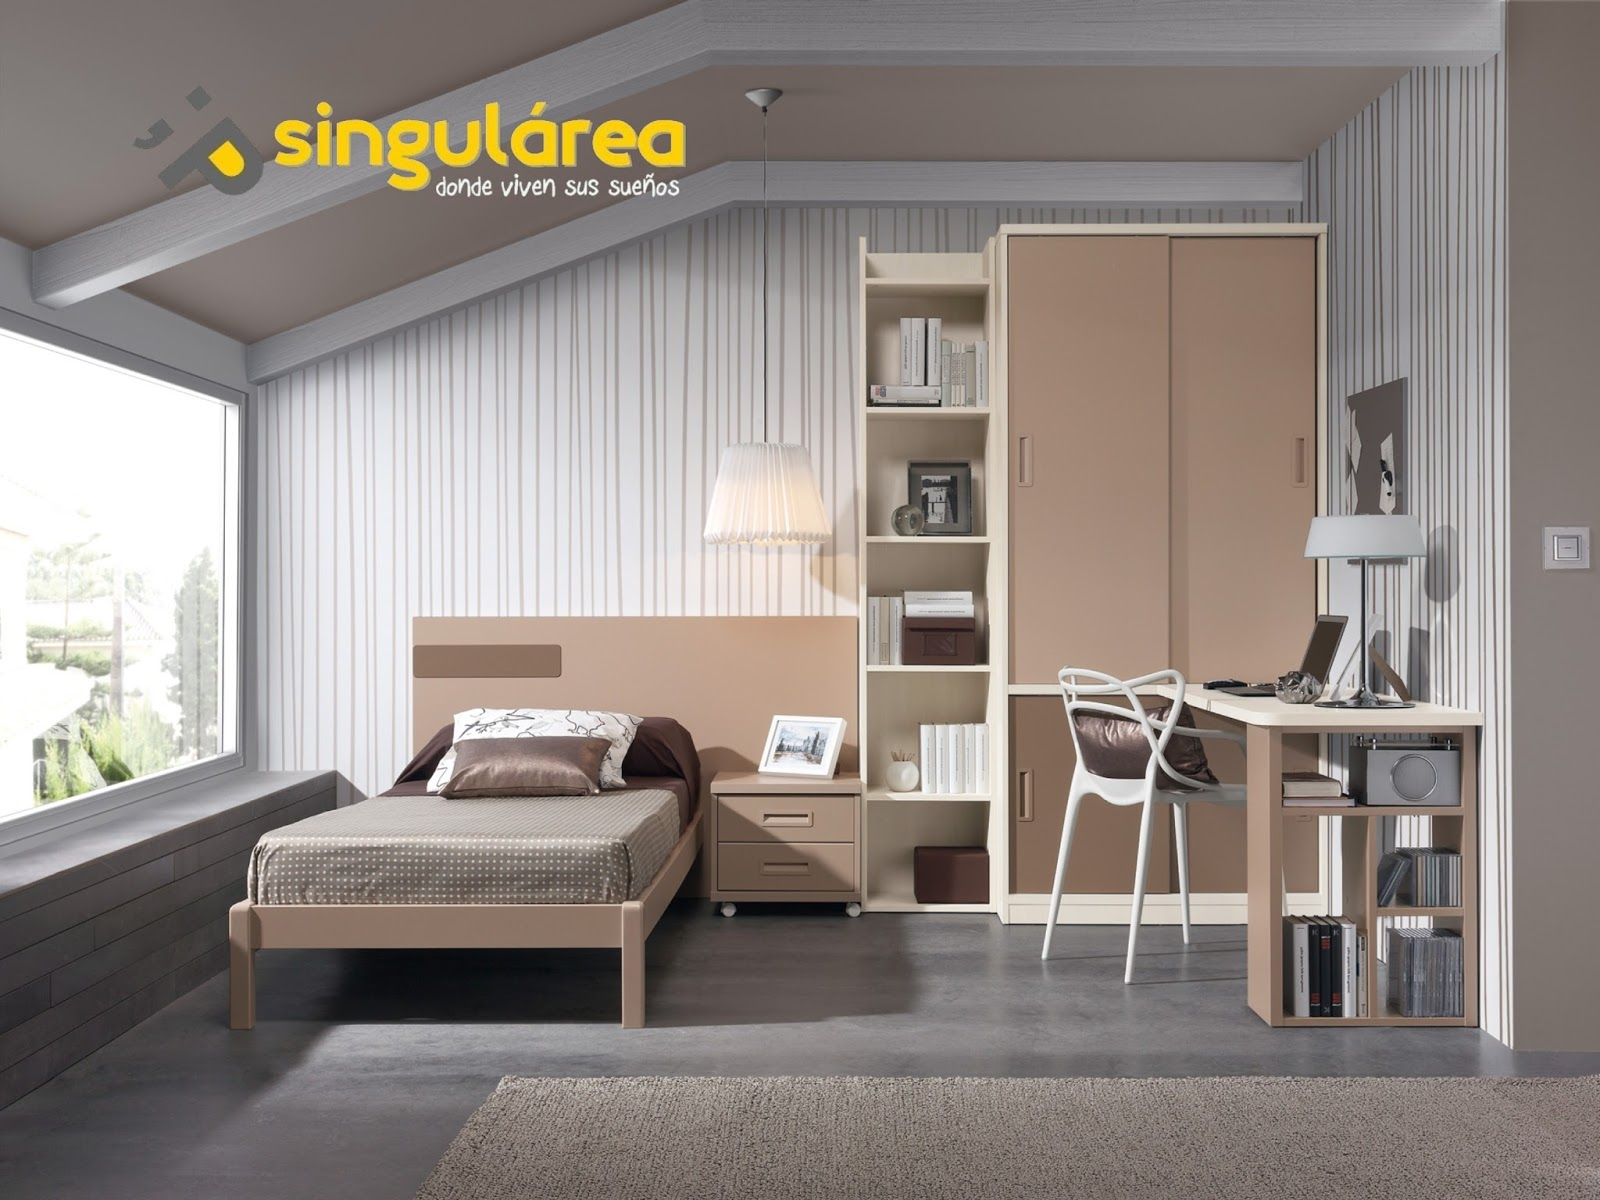 Diseno de dormitorios juveniles dise os arquitect nicos - Diseno de habitaciones juveniles ...